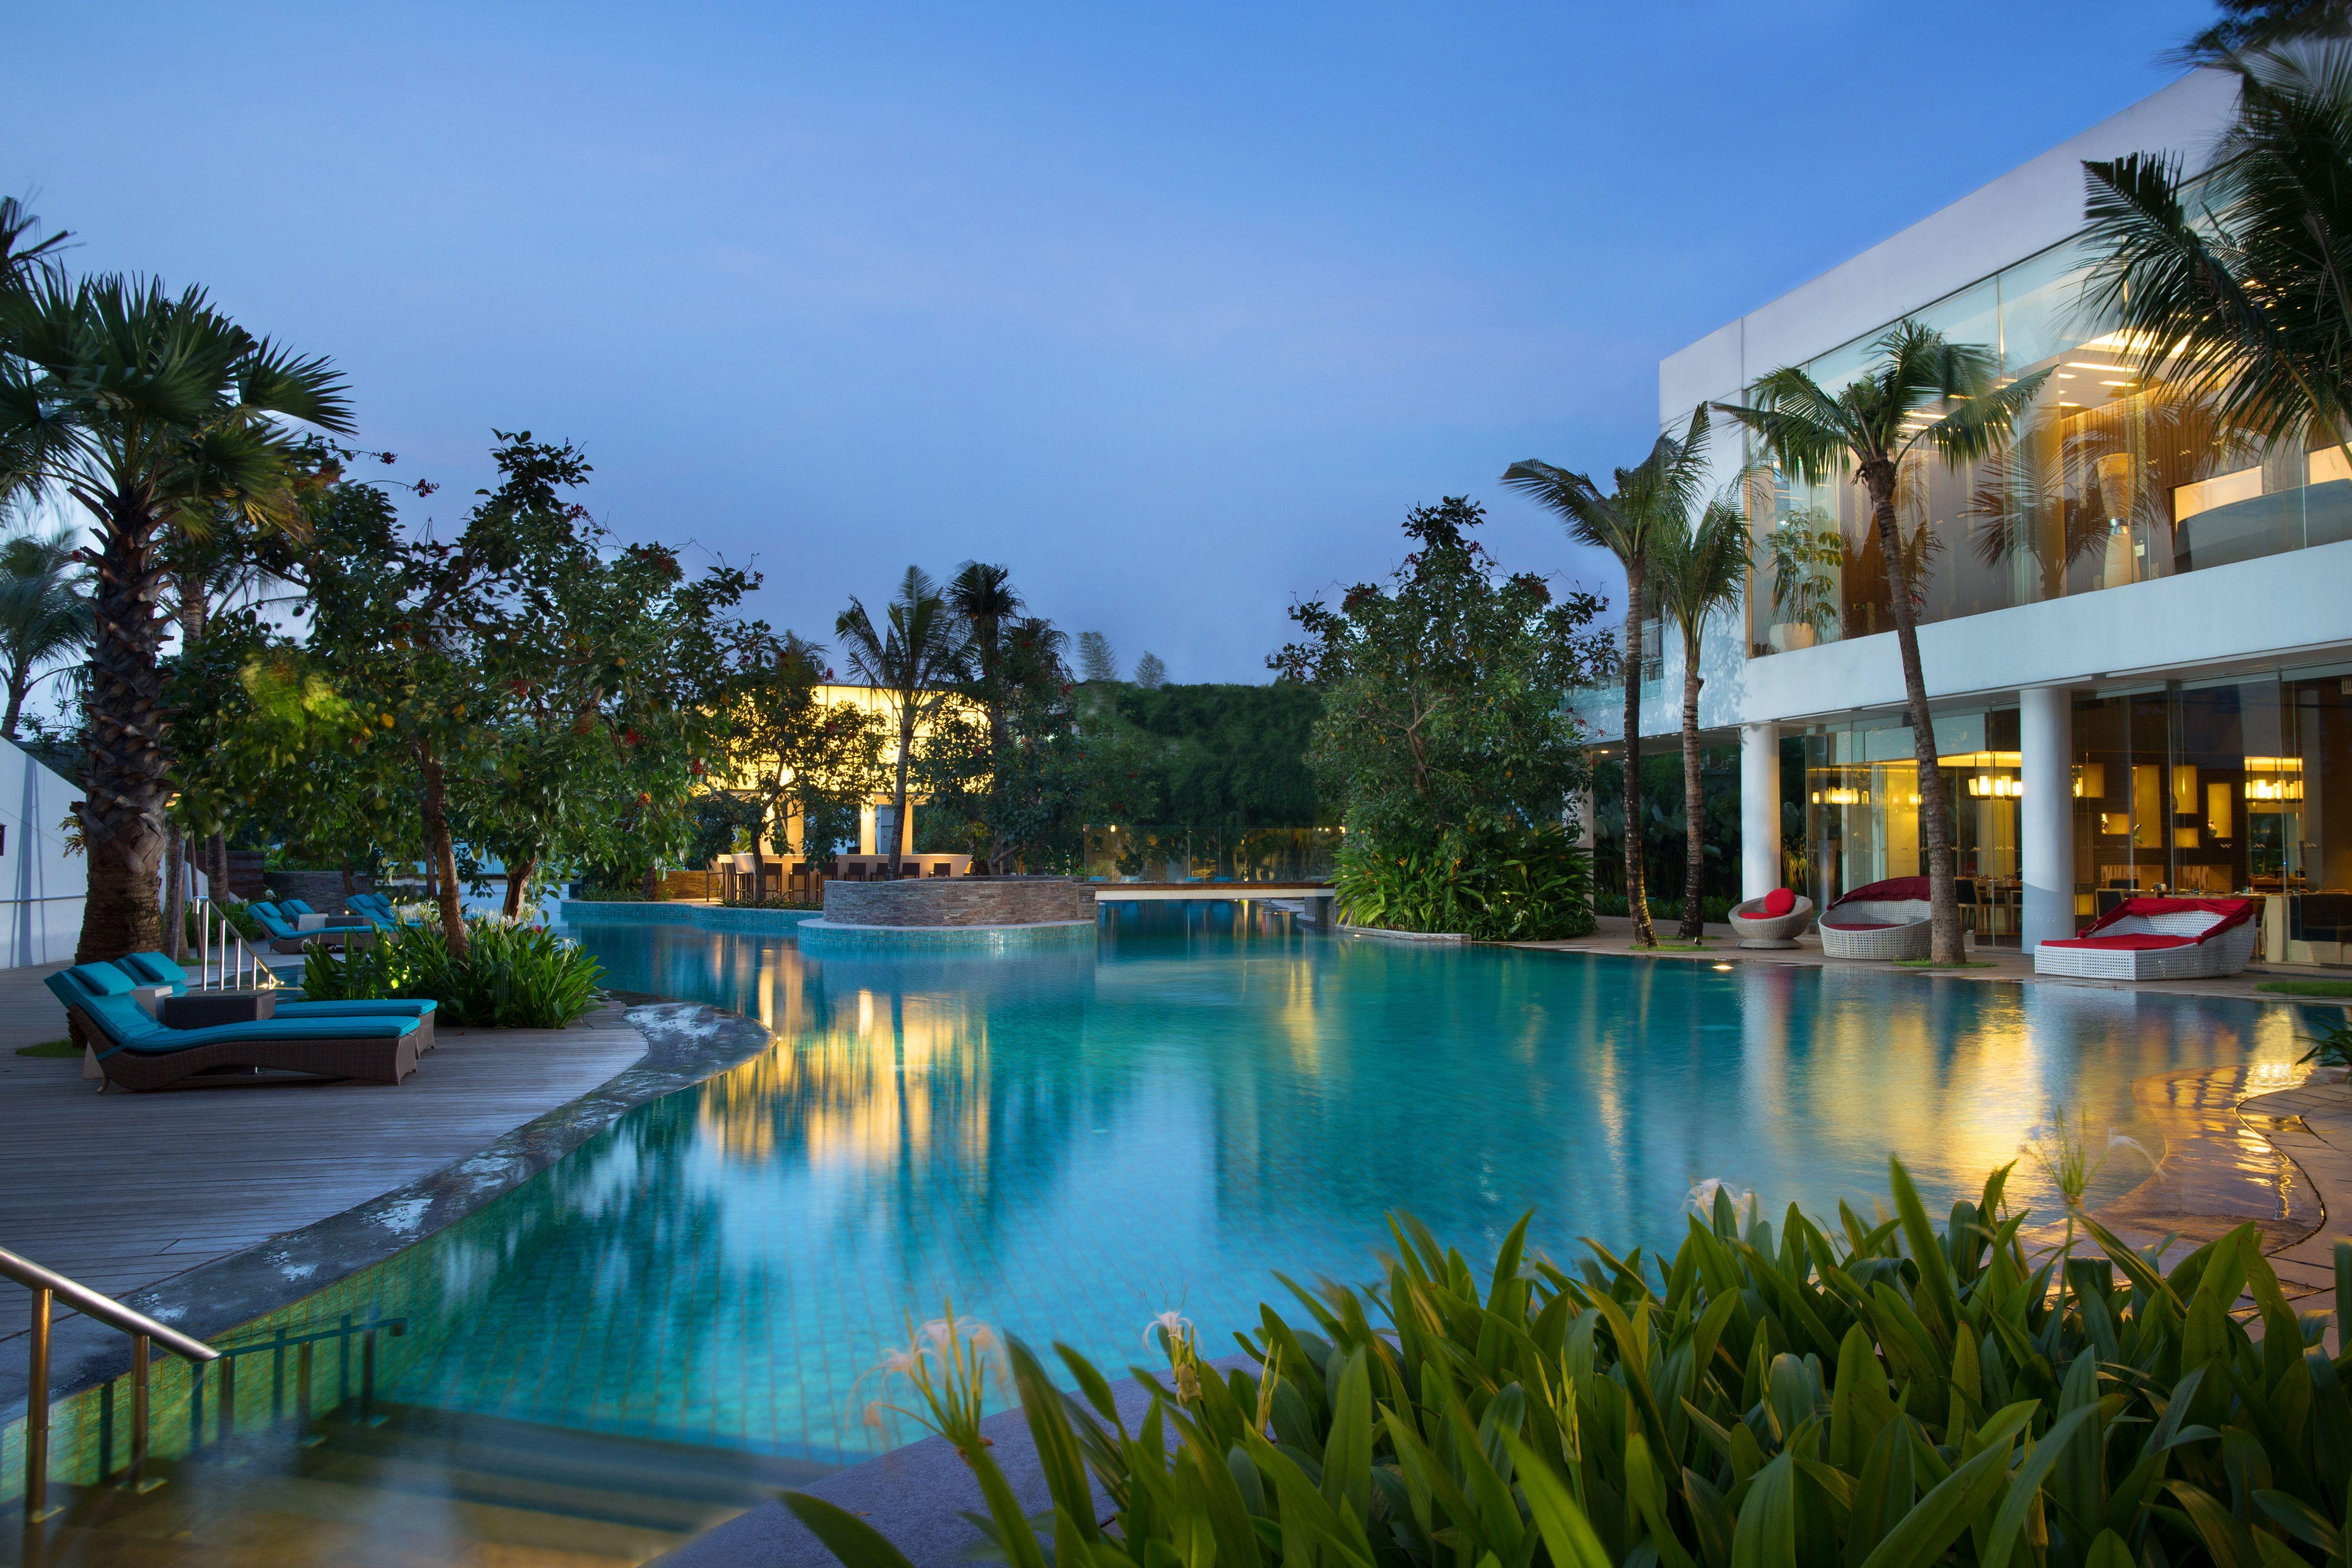 The contemporary DoubleTree by Hilton JakartaDiponegoro